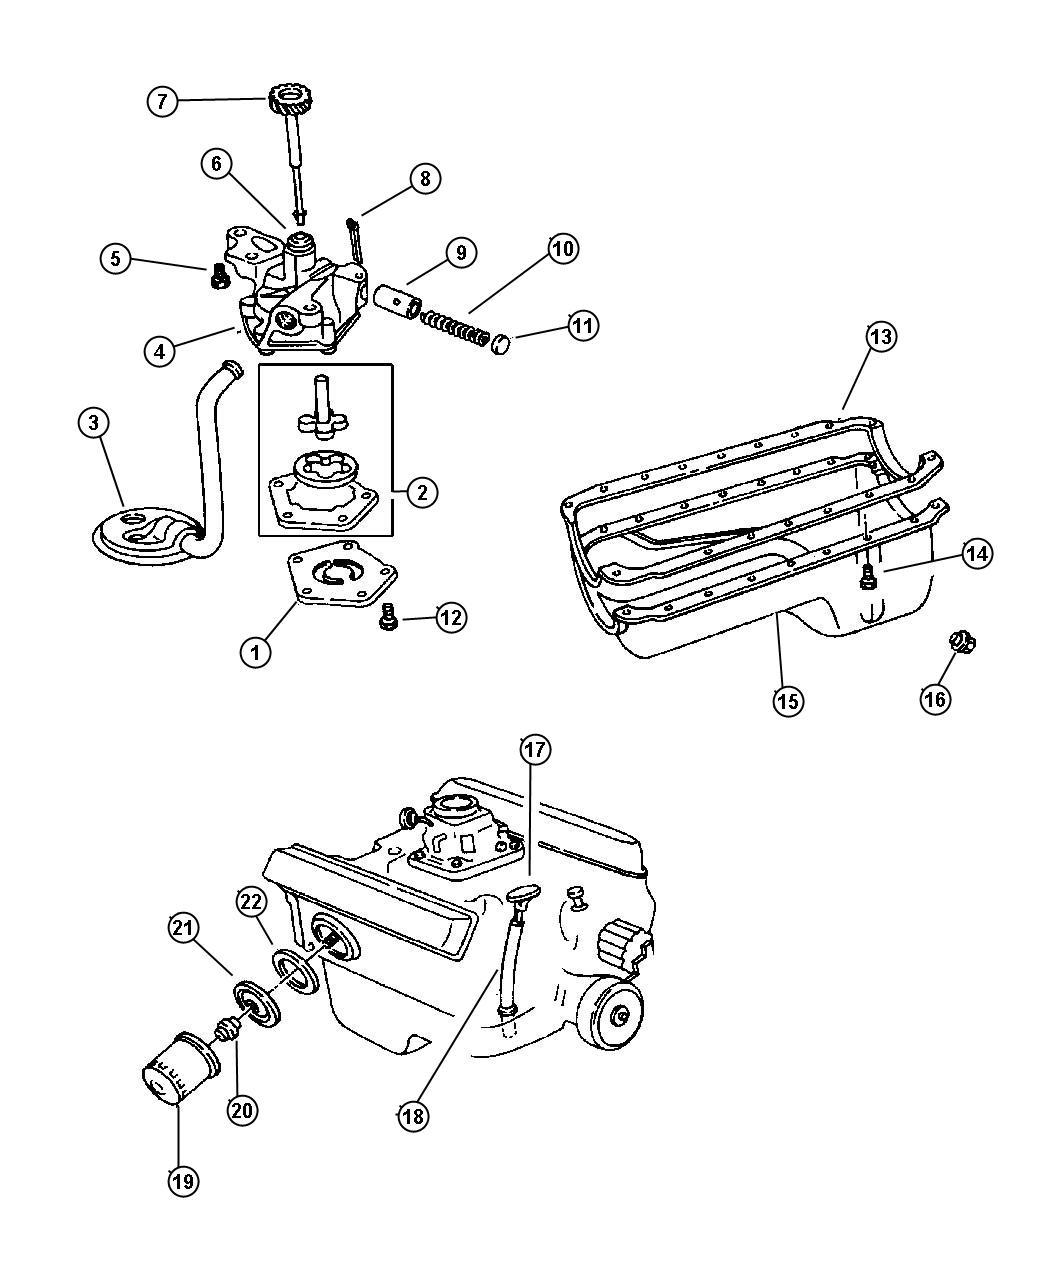 1998 Dodge Dakota Plate. Oil filter adapter. Engine ...